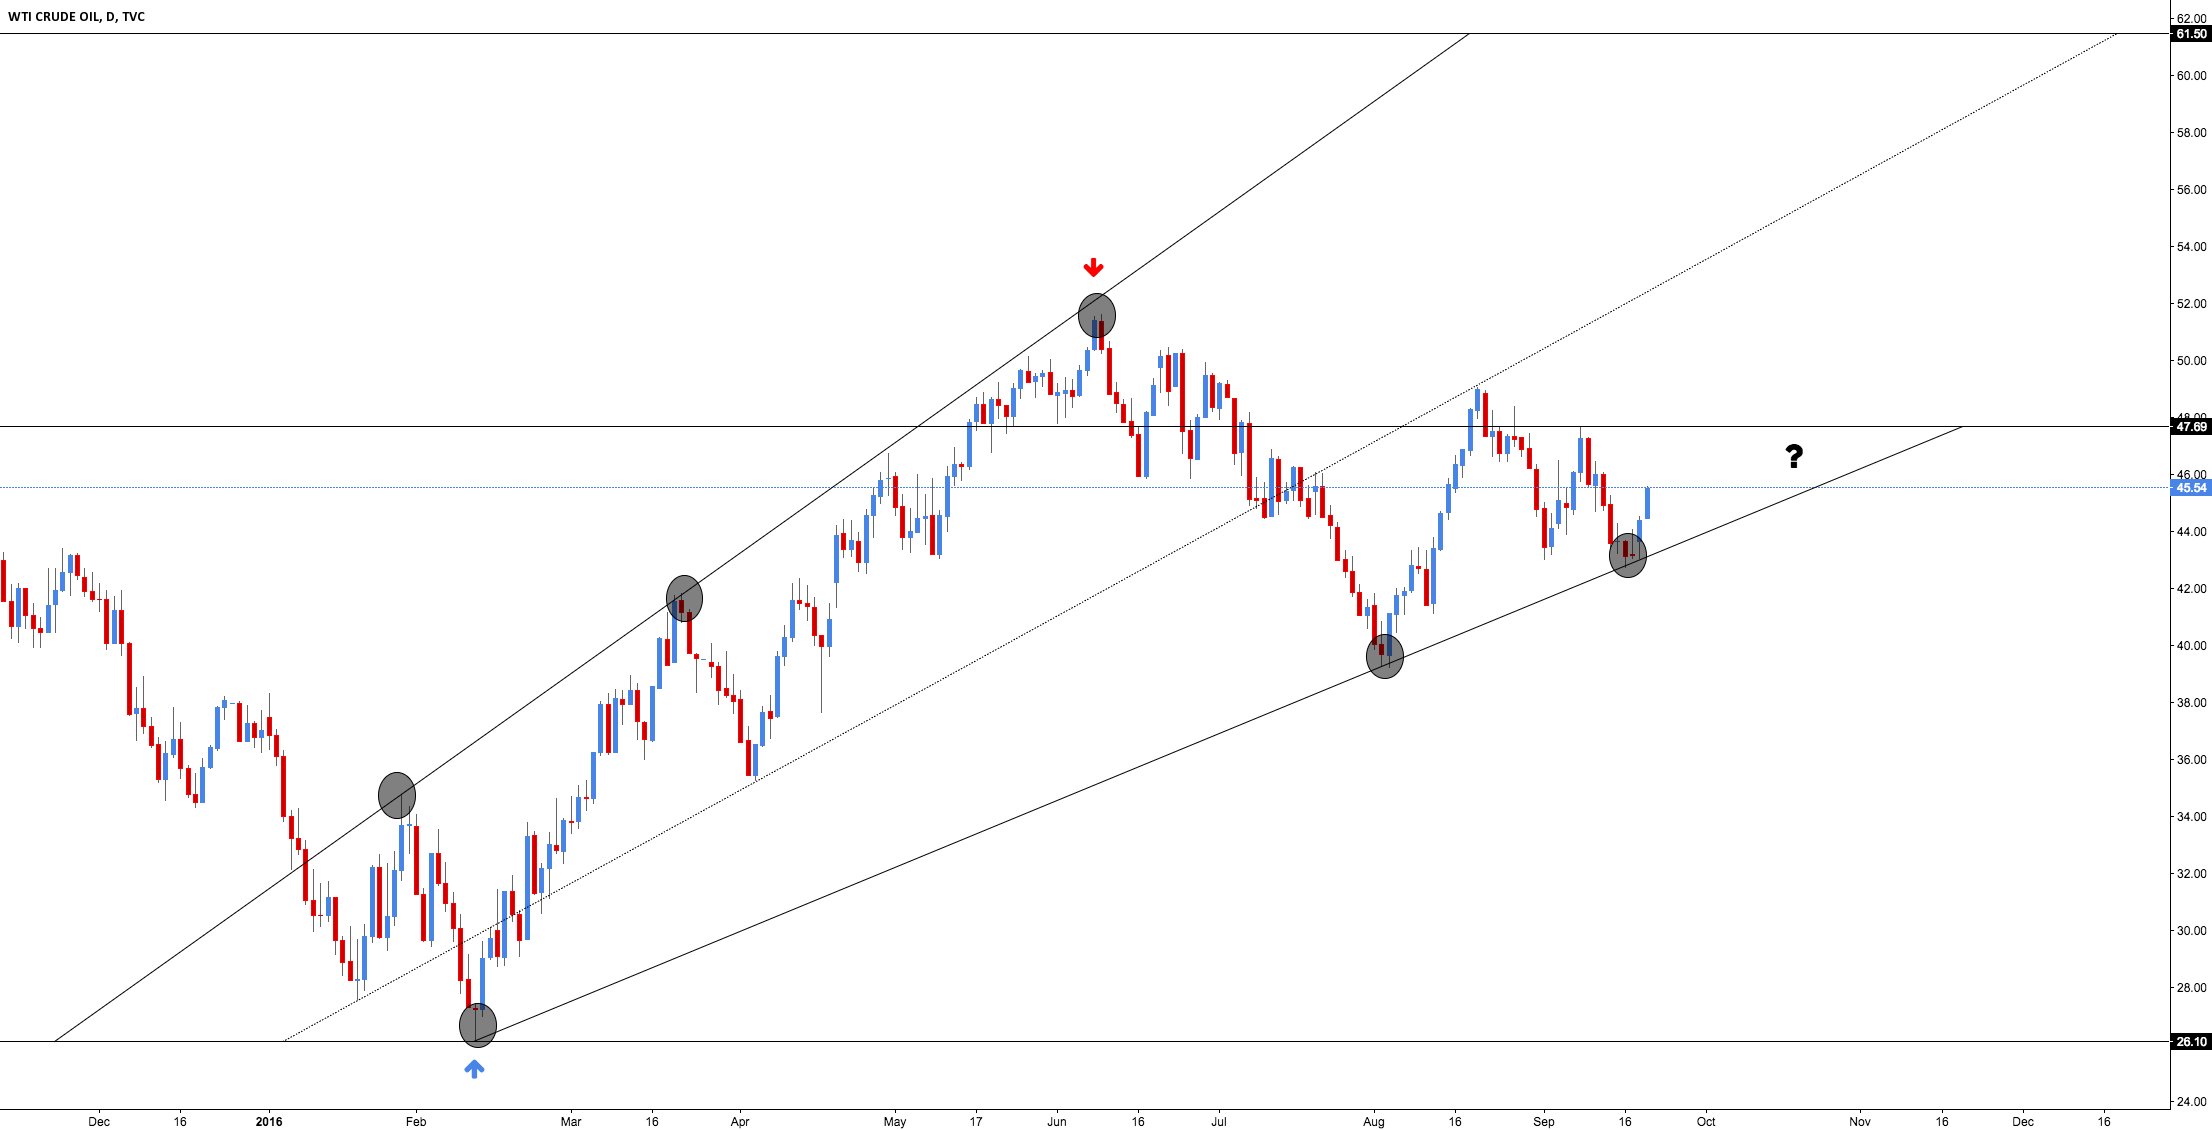 Crude Oil - Market Direction